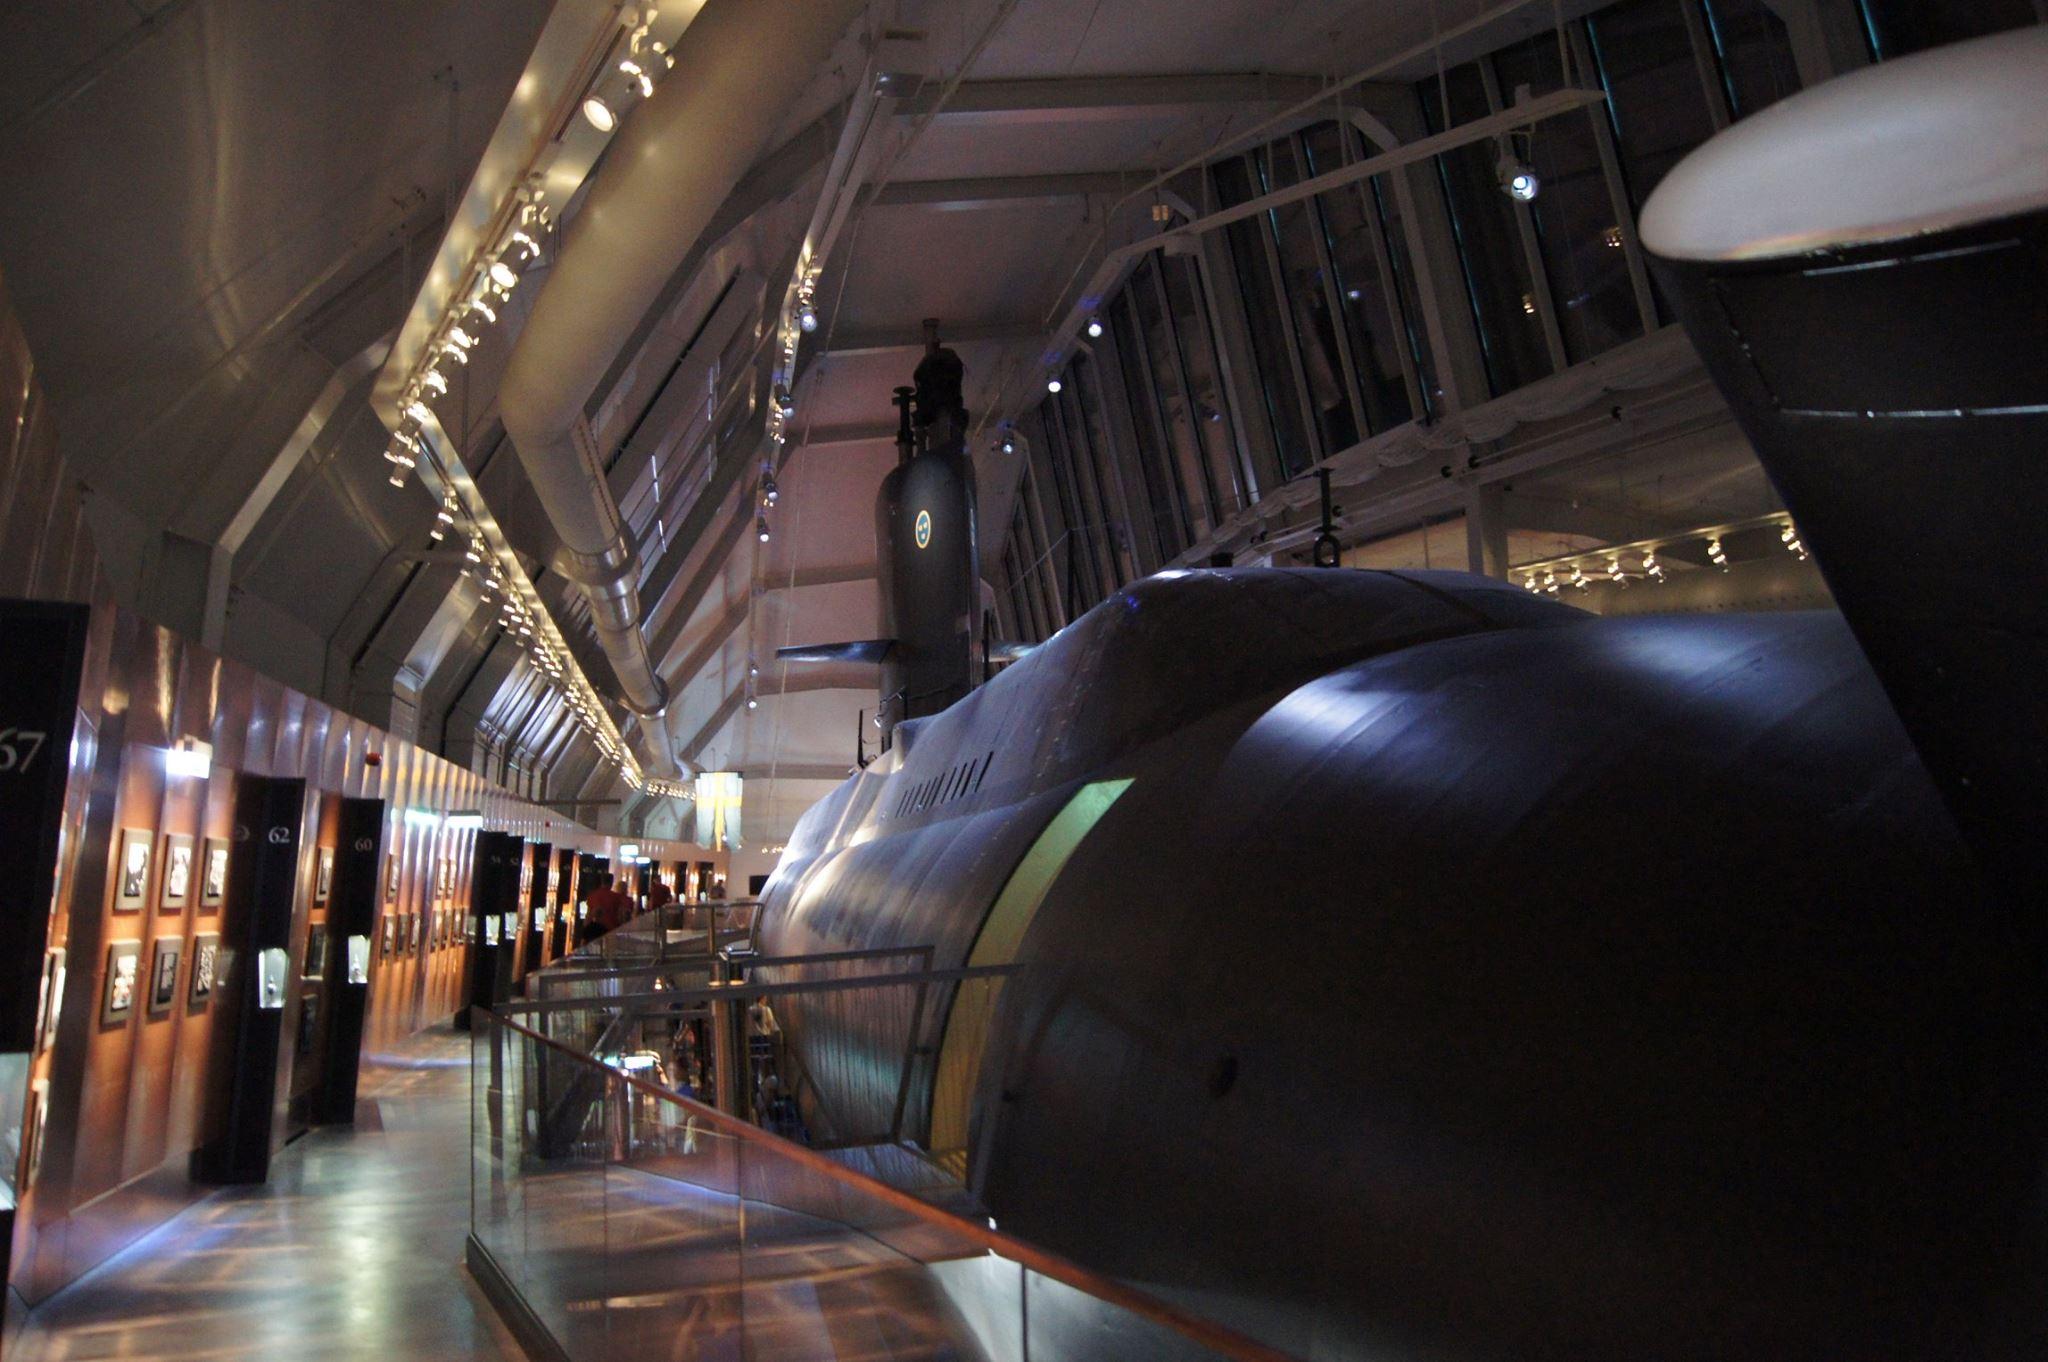 Ubåtshallen på Marinmuseum